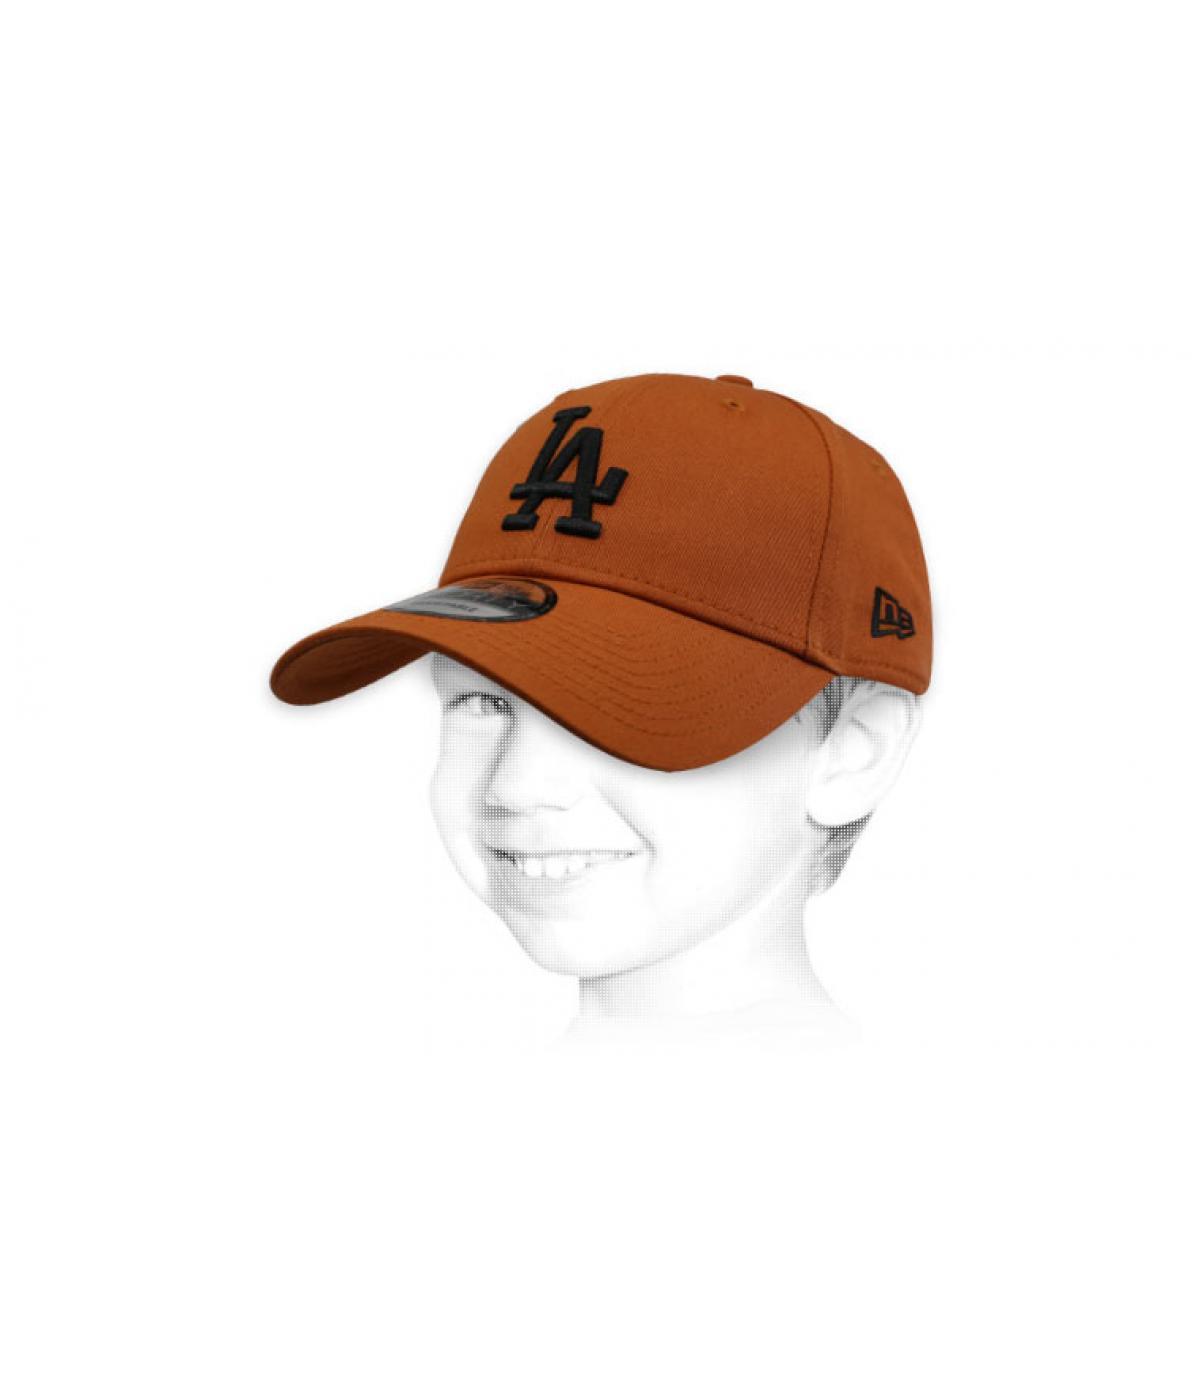 gorra LA niño marrón